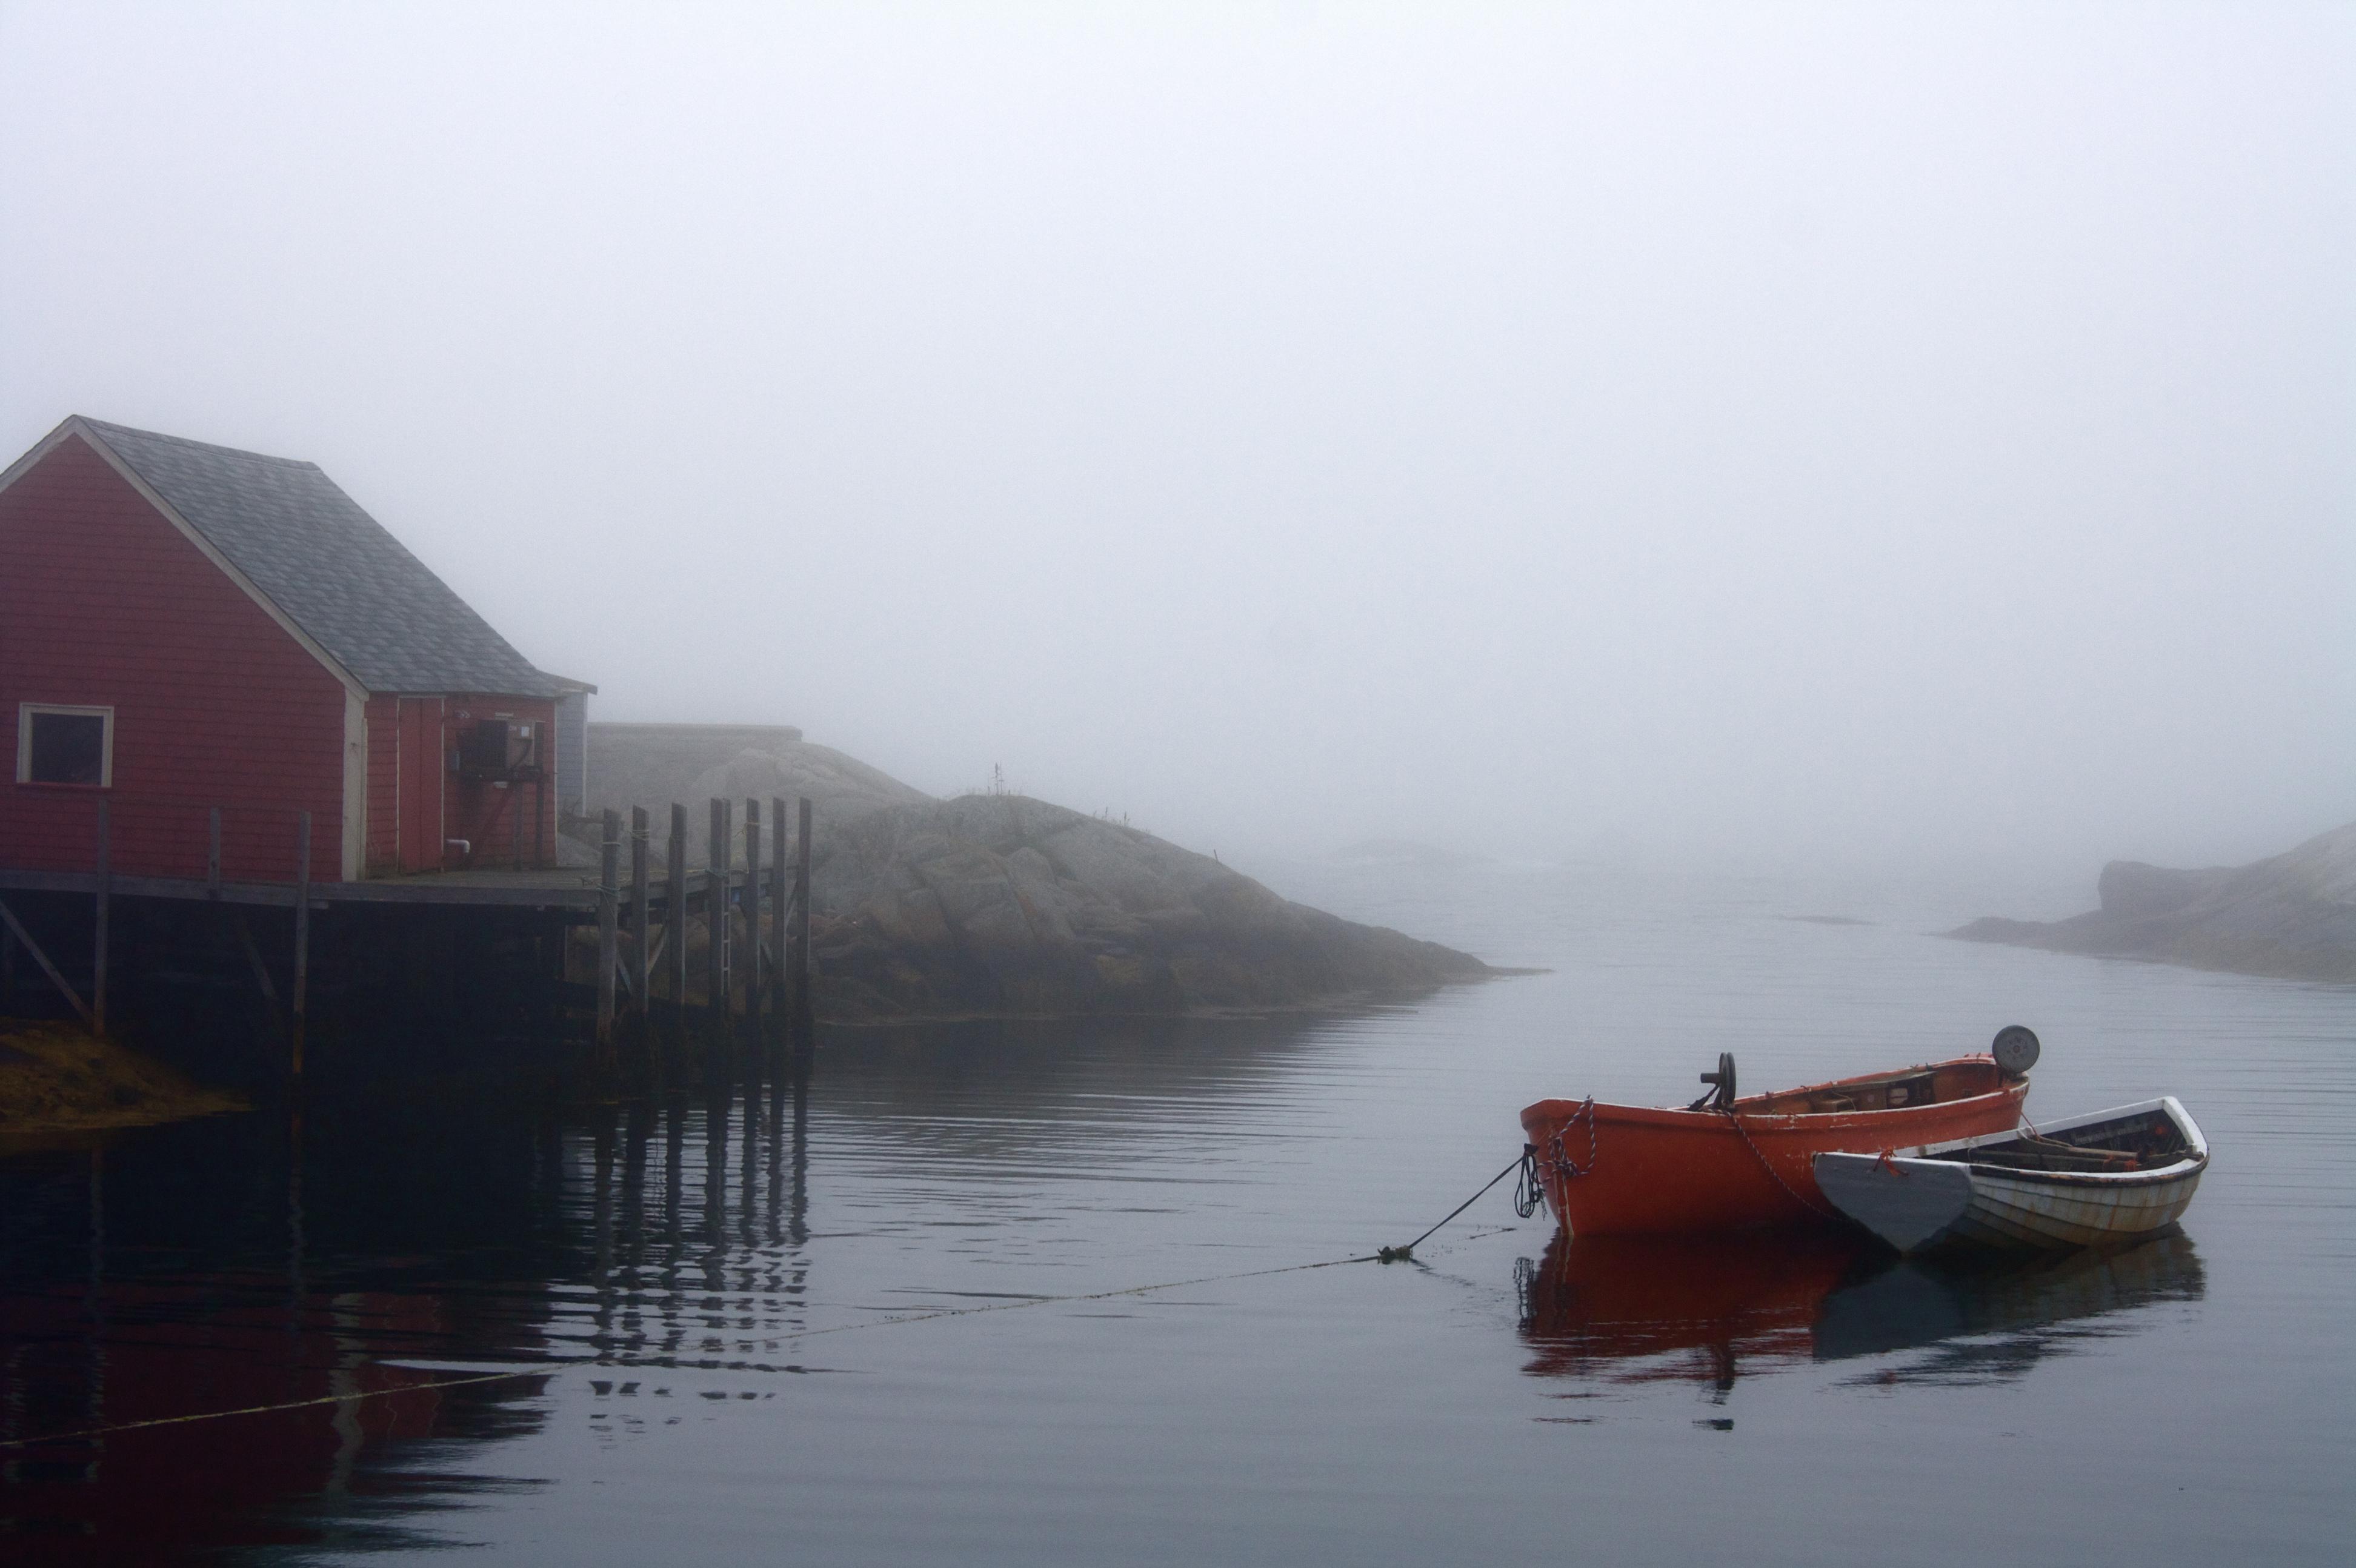 Boats, Fishing, Fog, Harbor, Haze, HQ Photo